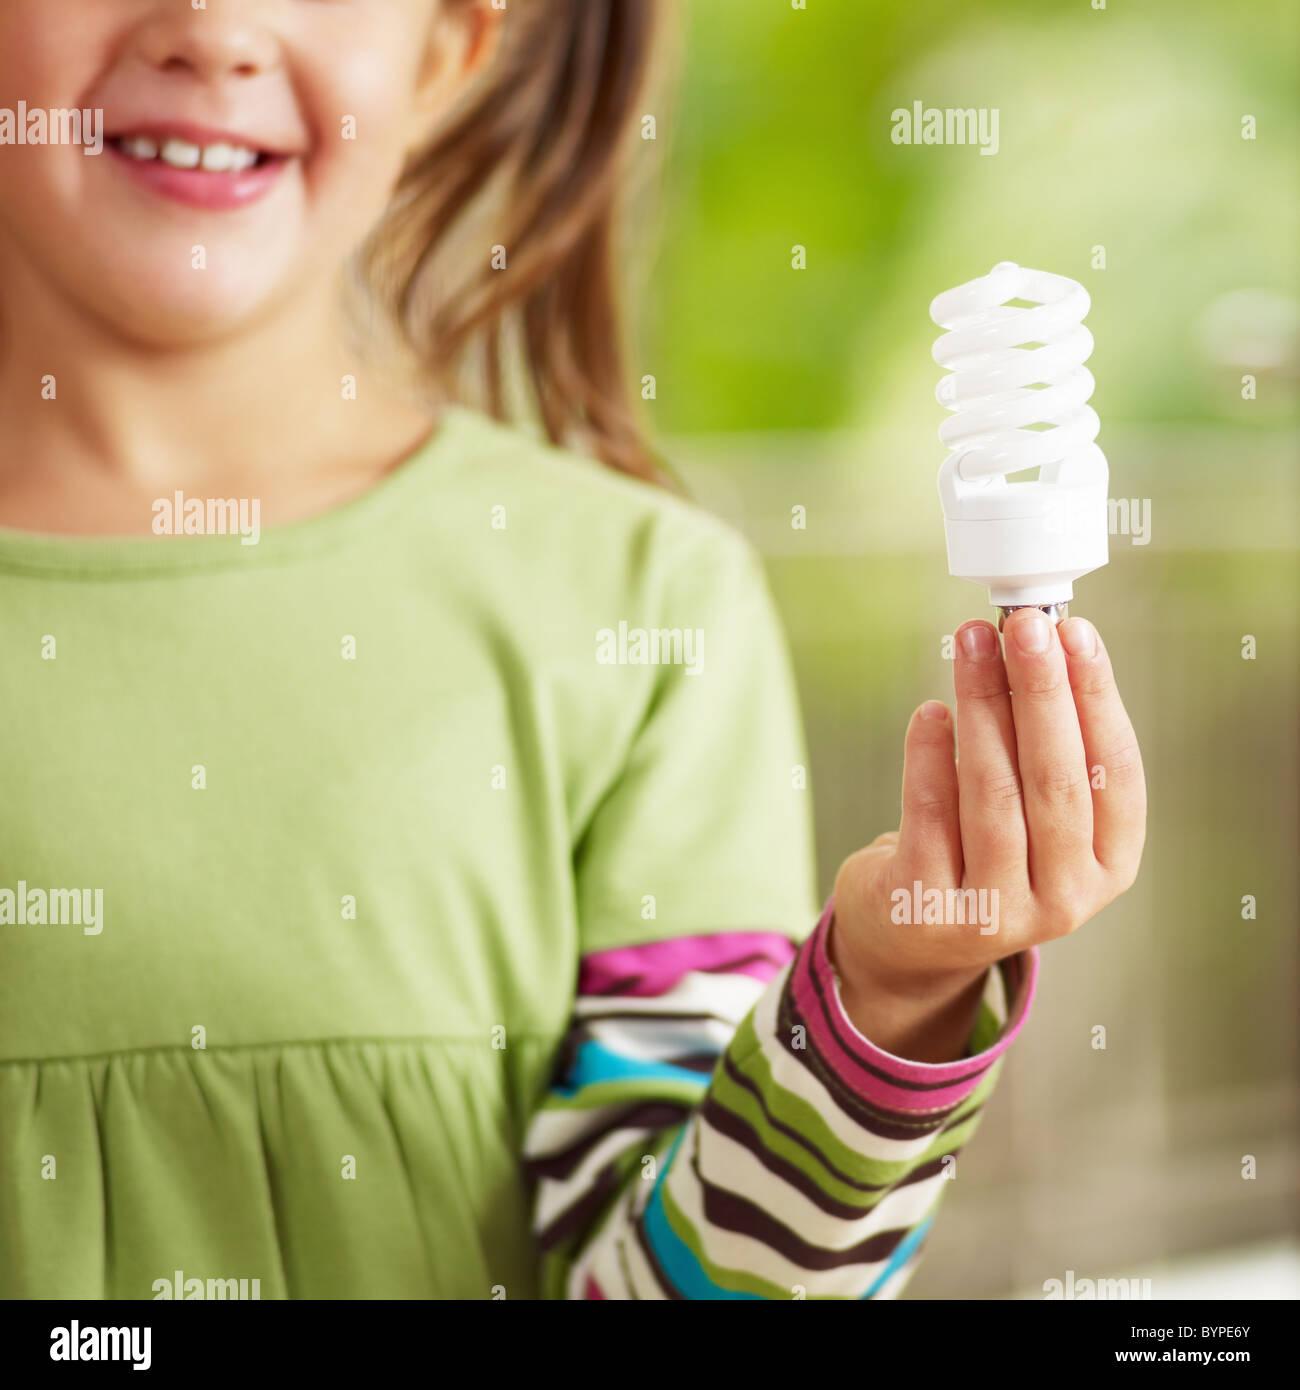 Mädchen hält die Glühbirne und lächelnd. Selektiven Fokus Stockbild